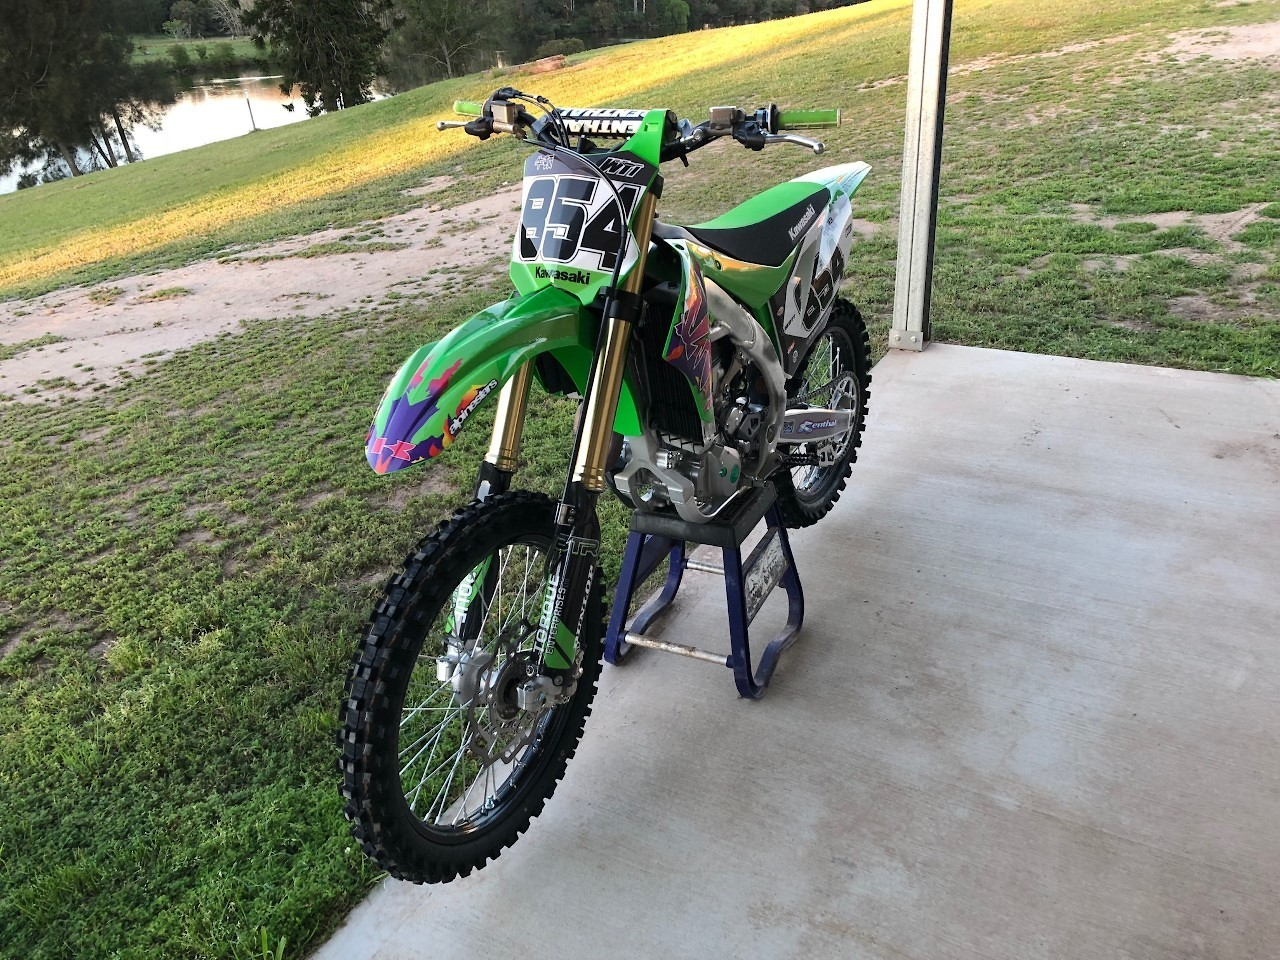 Brad's 19 KX450